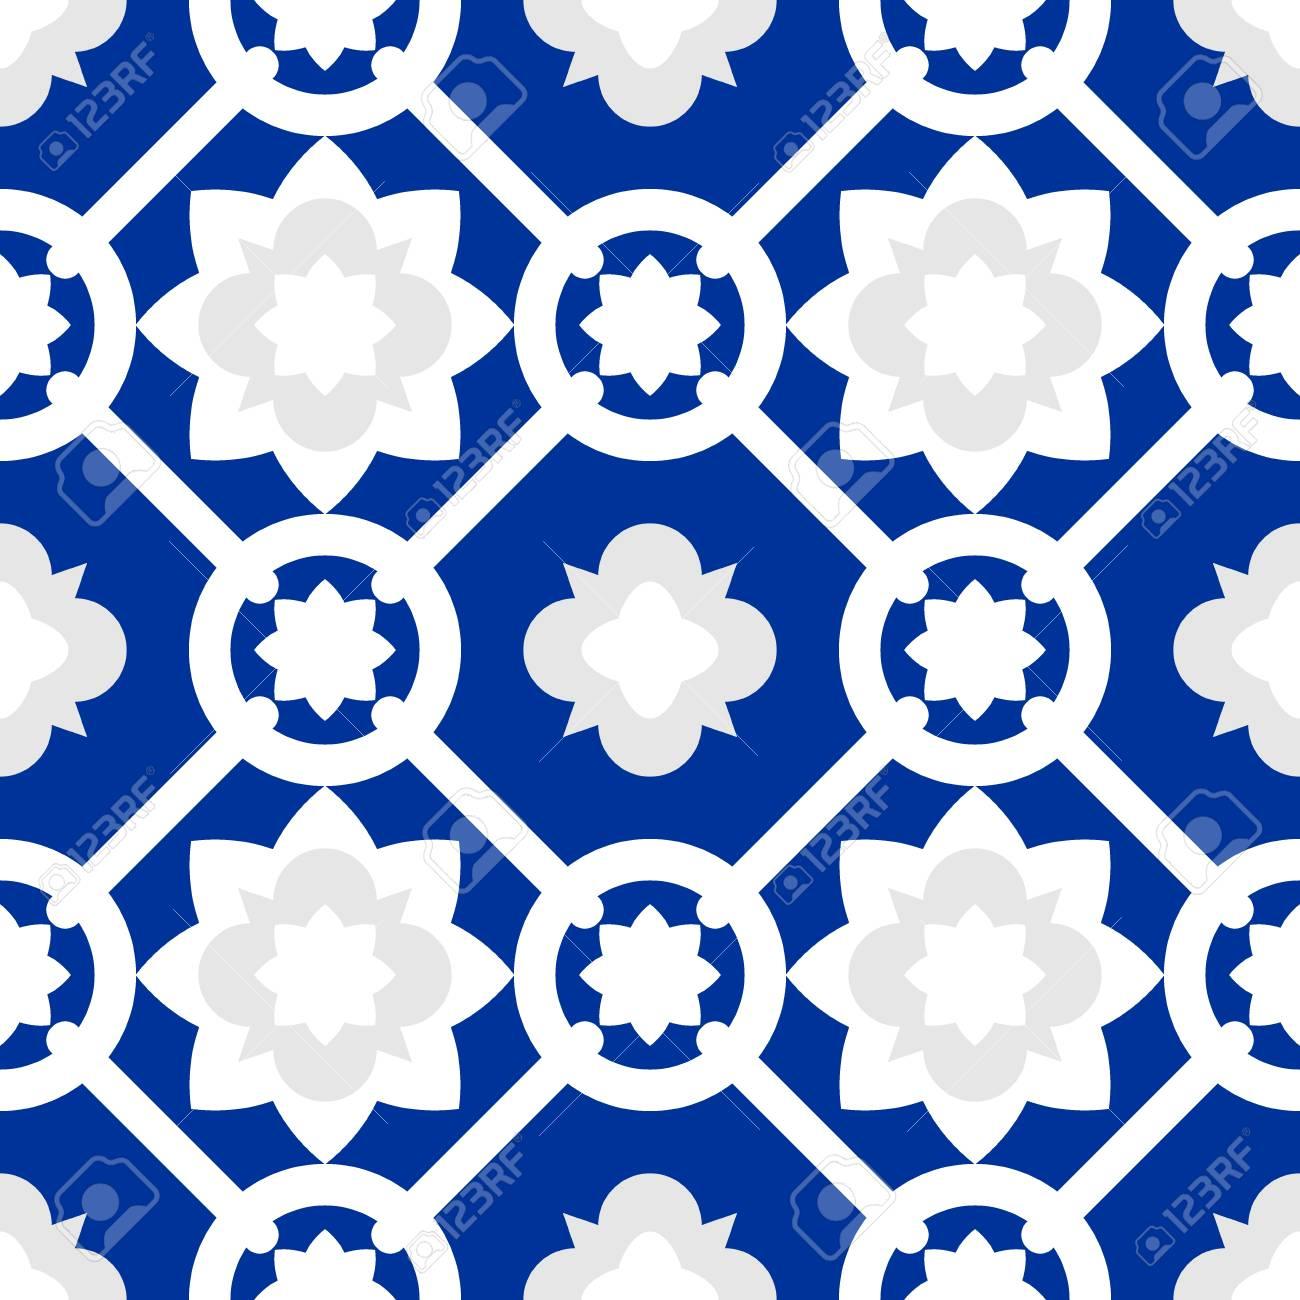 Tile Indigo Blue Decorative Floor Tiles Vector Pattern Royalty Free ...